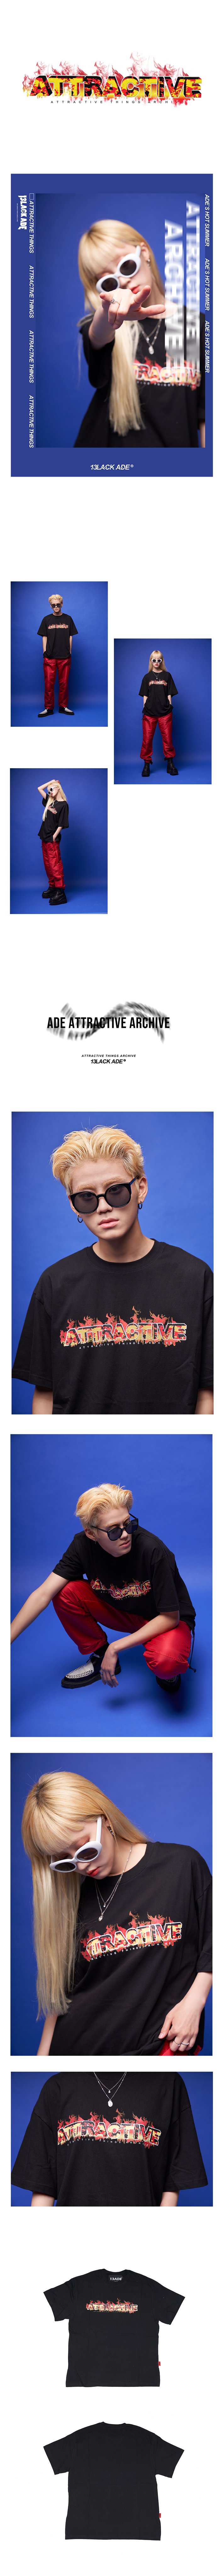 Fire-Attractive-black.jpg